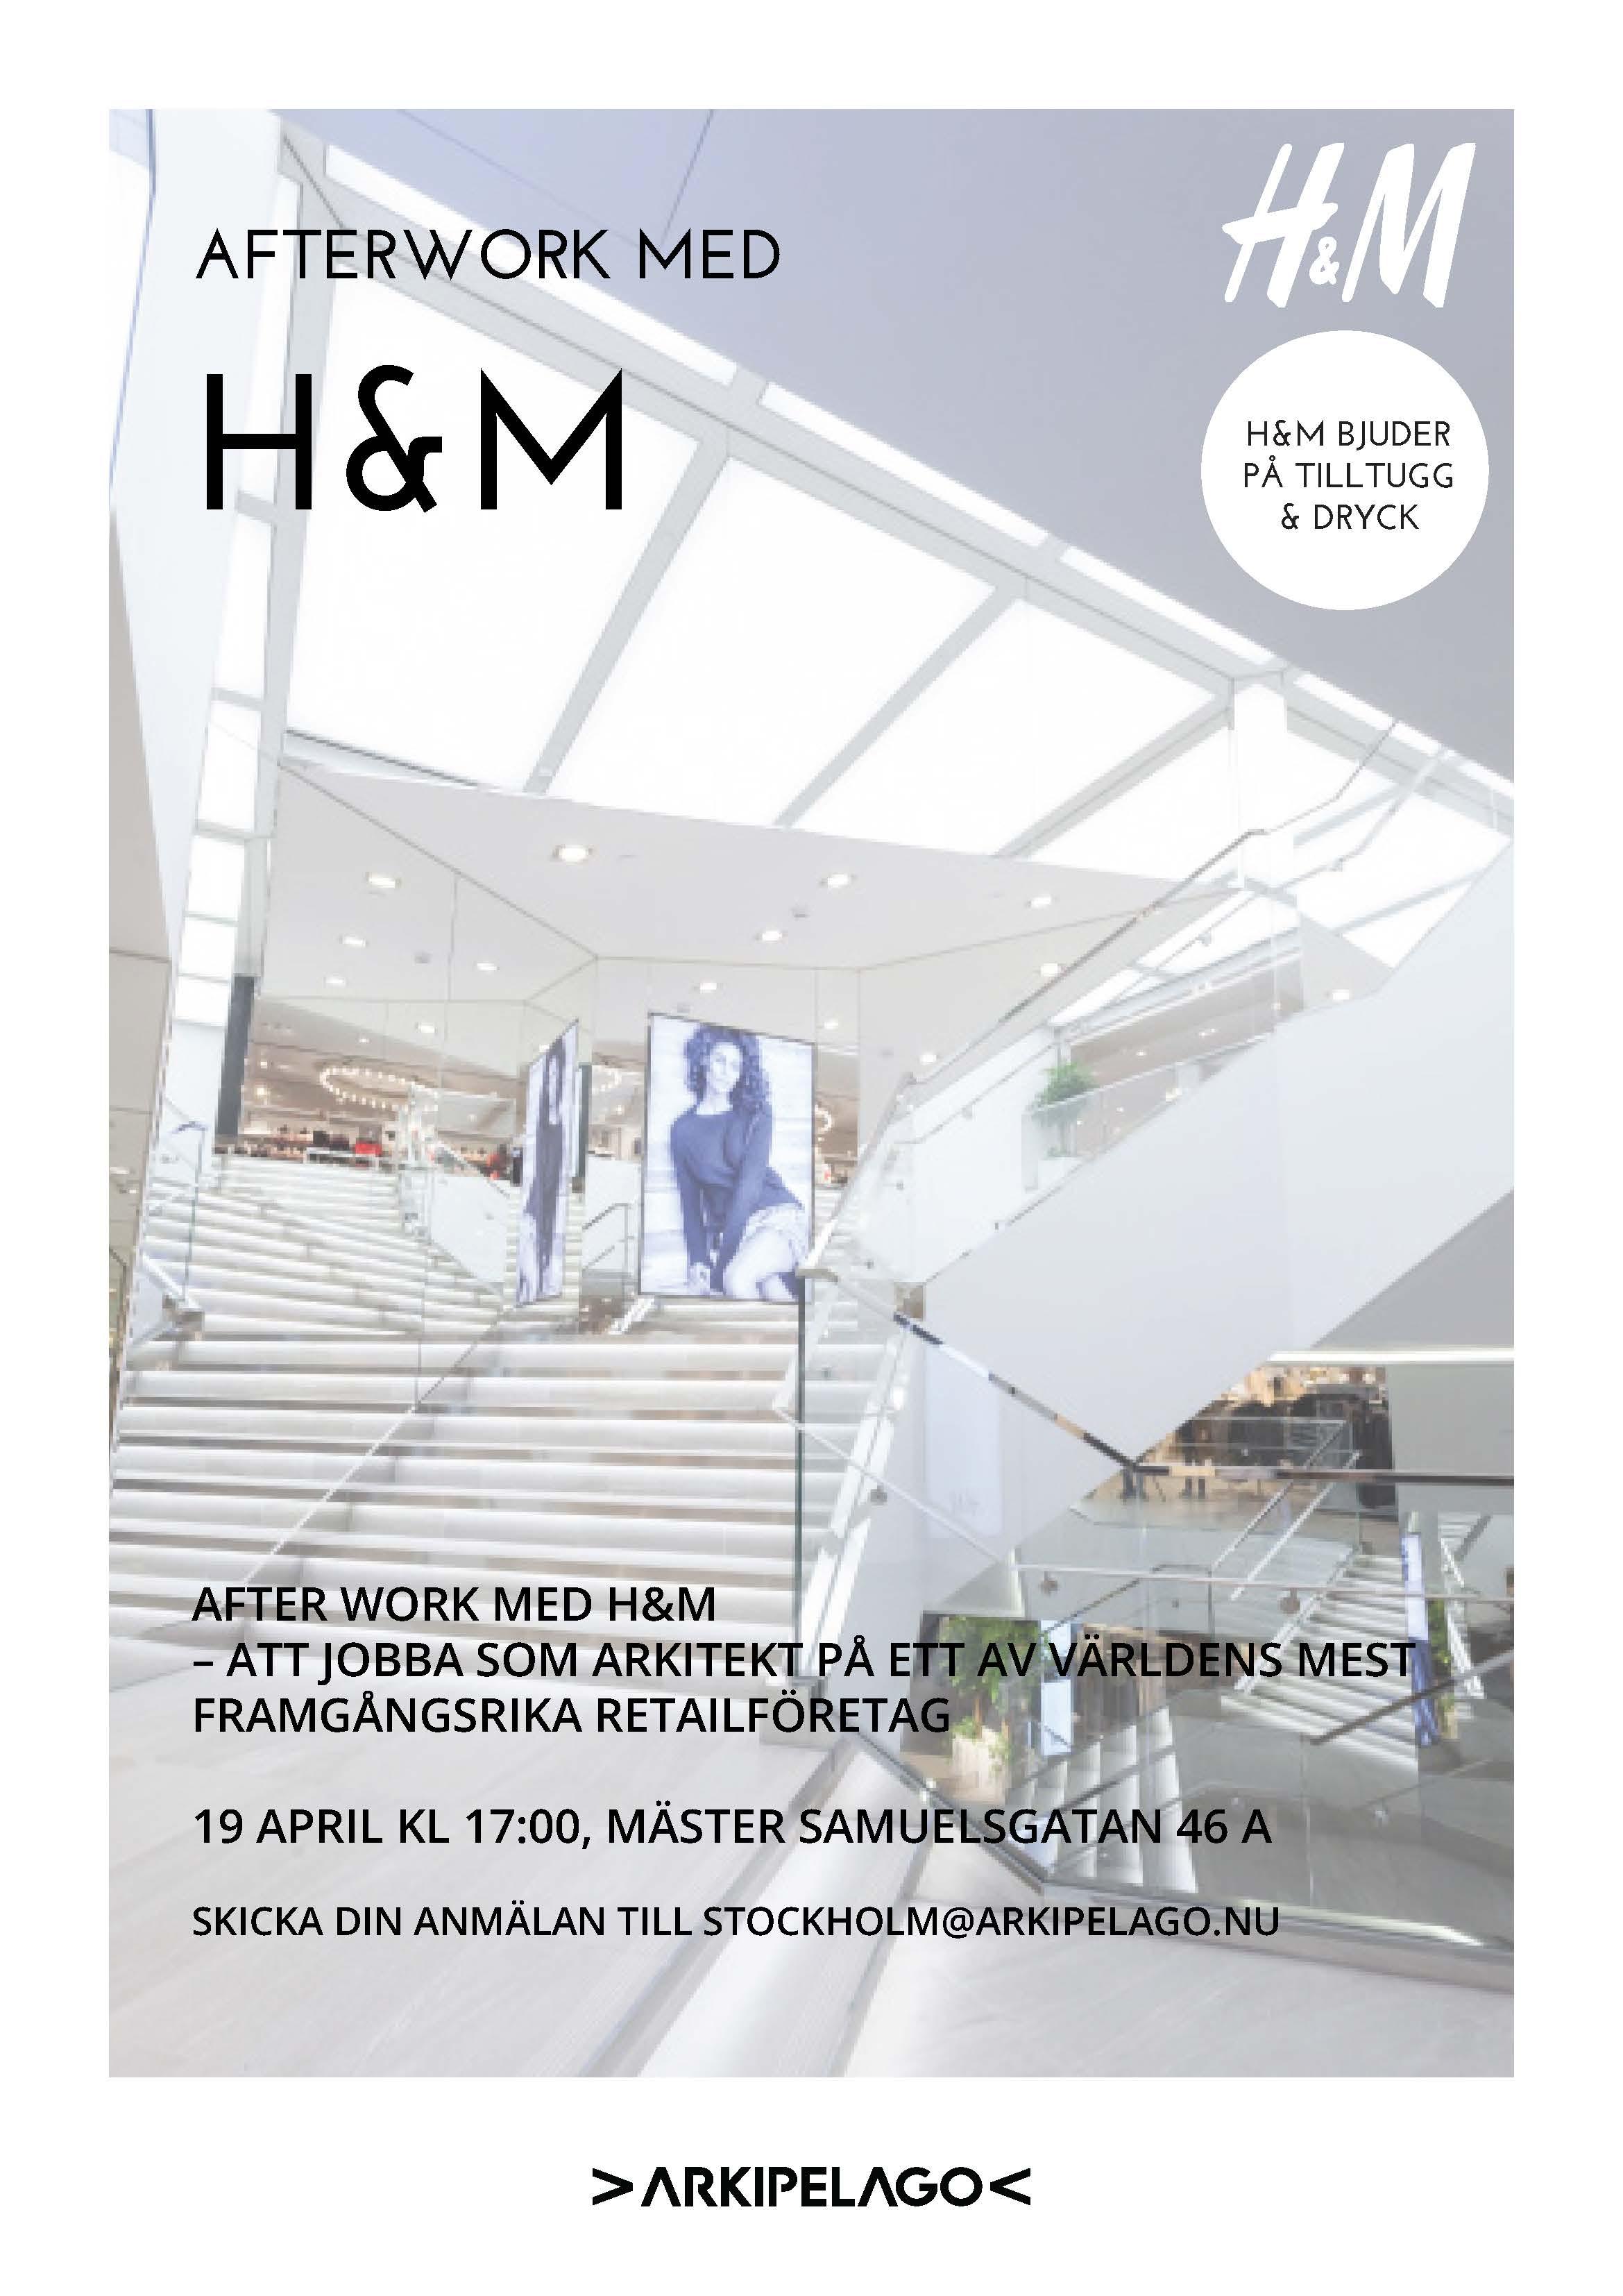 AFTERWORK H&M